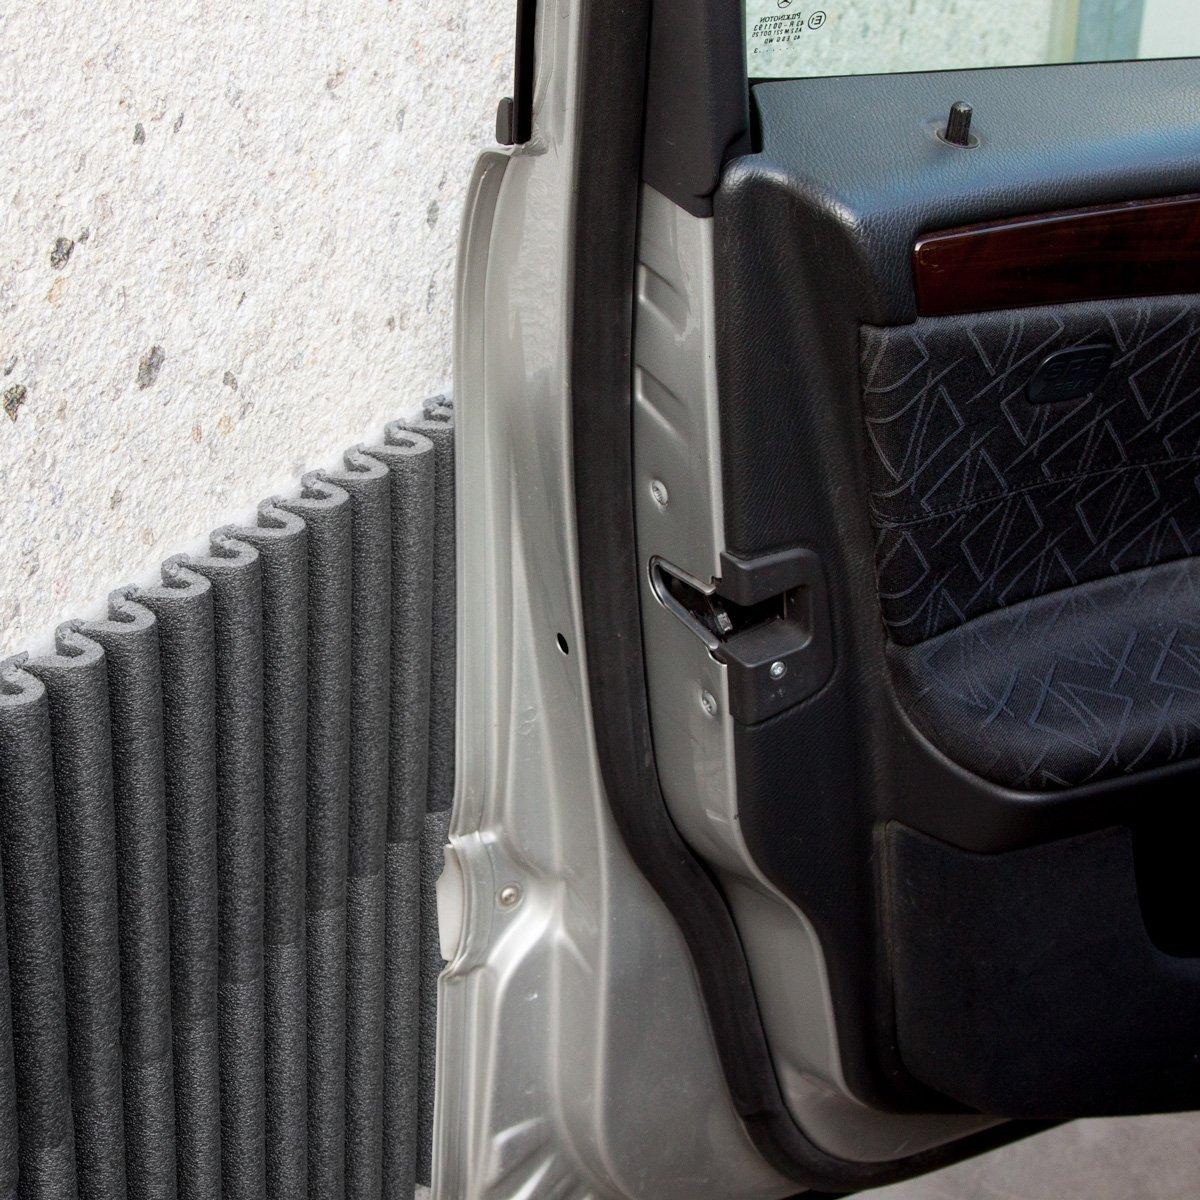 Ghb car door protectors self adhesive garage wall protectors with mondaplen wall bumper tiles lots more material lower costsquare inch set rubansaba